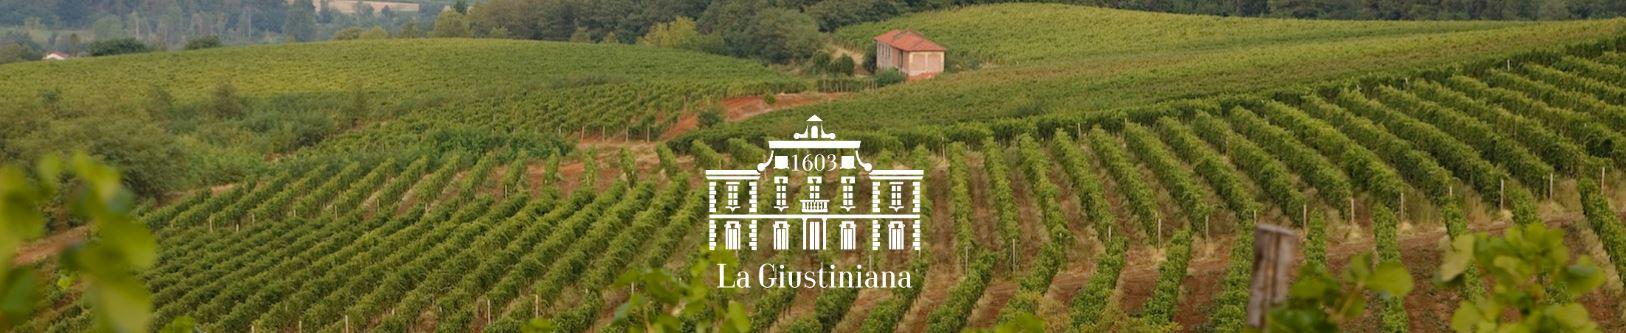 La-Guistinana-Gavi-di-Gavi